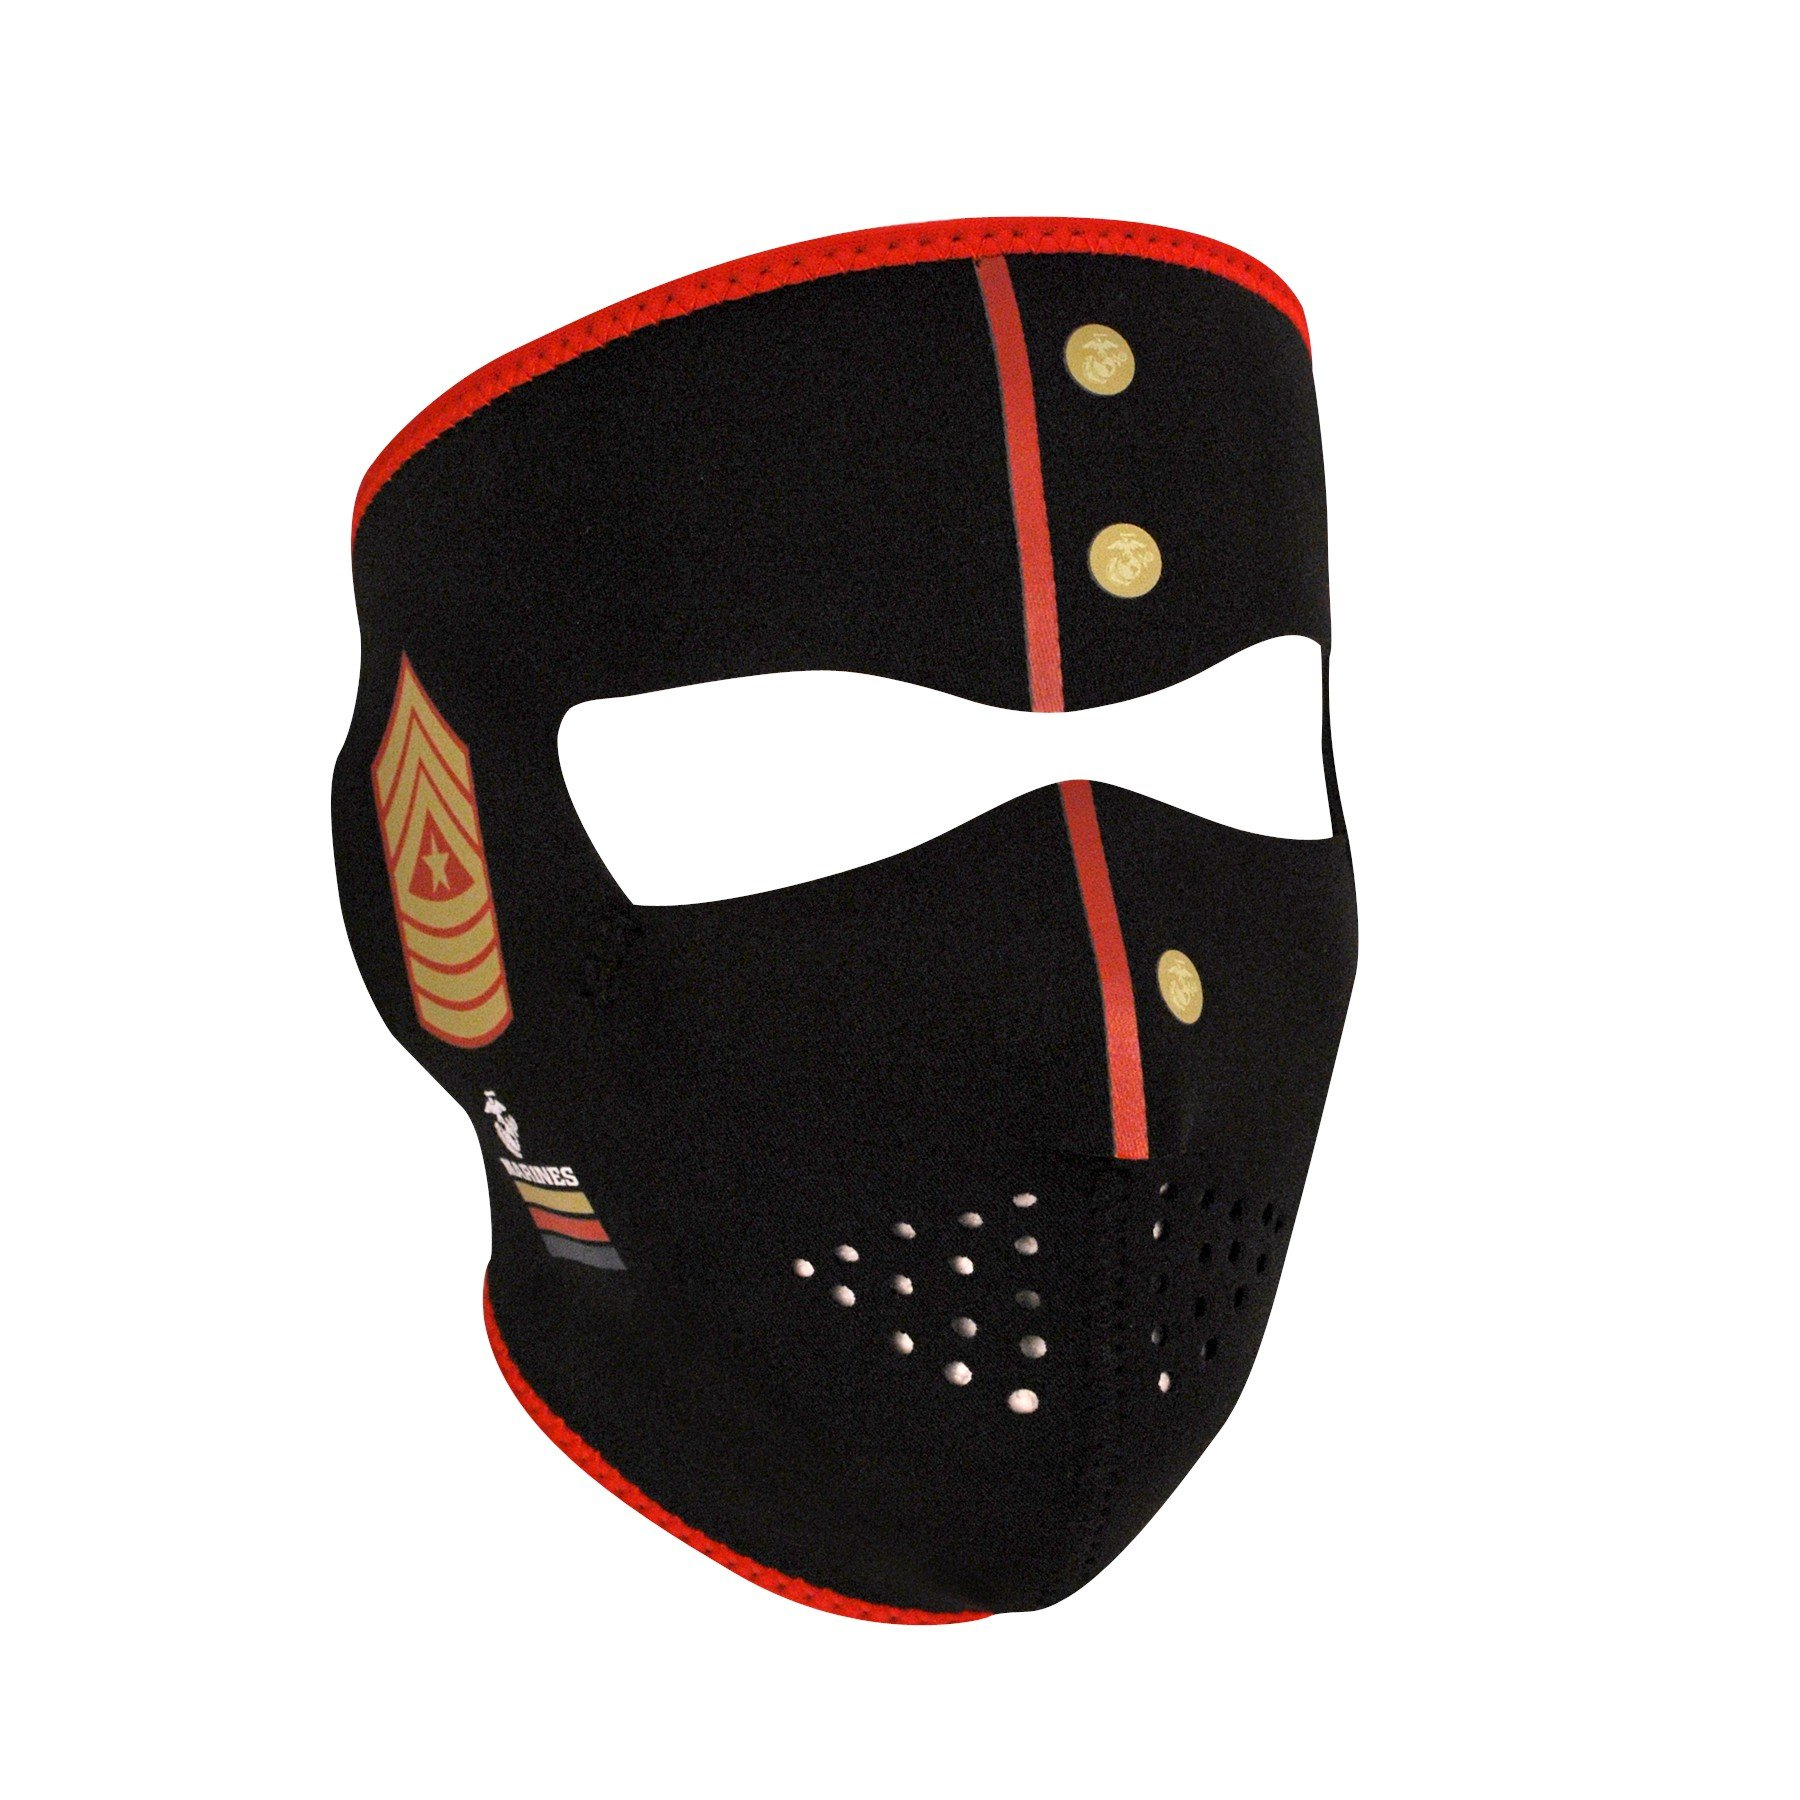 Zan Headgear WNFM801, Full Mask, Neoprene, USMC, Marines Uniform